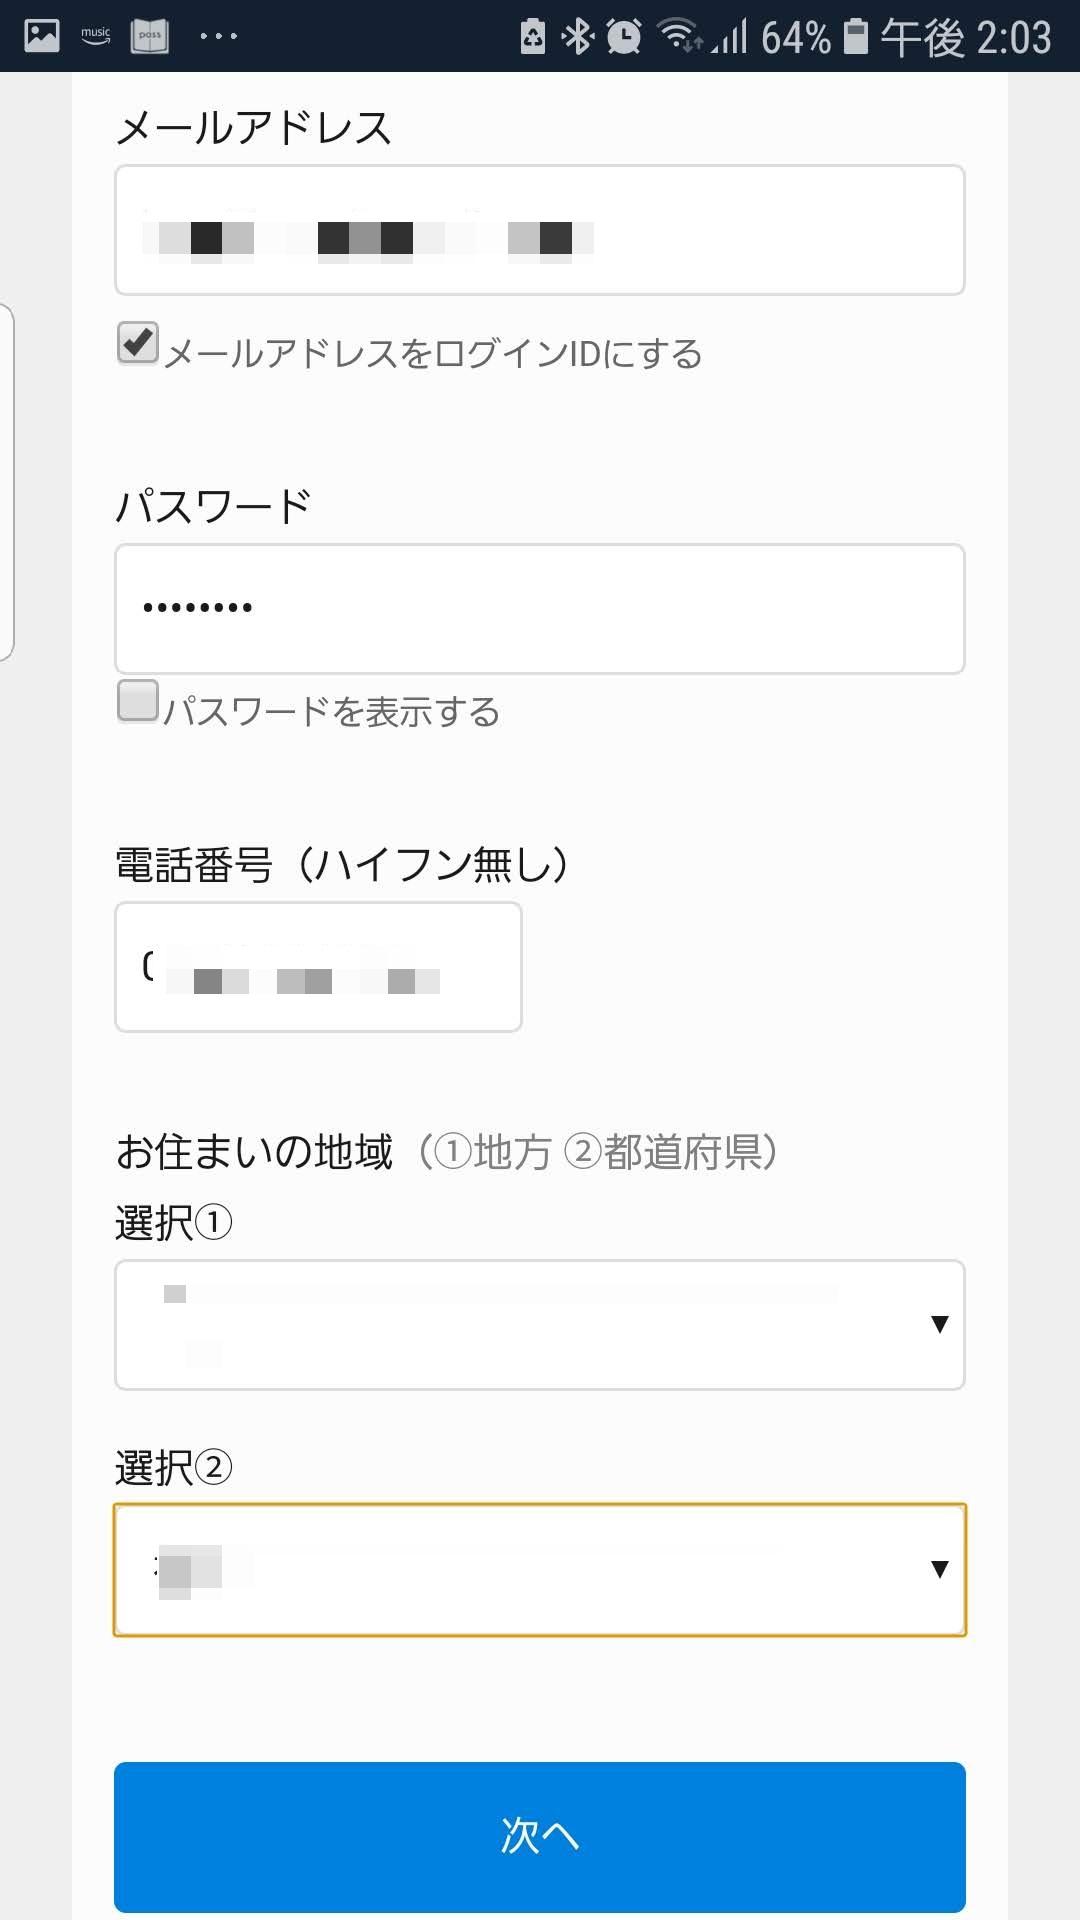 U-NEXT31日無料トライアル申込画面